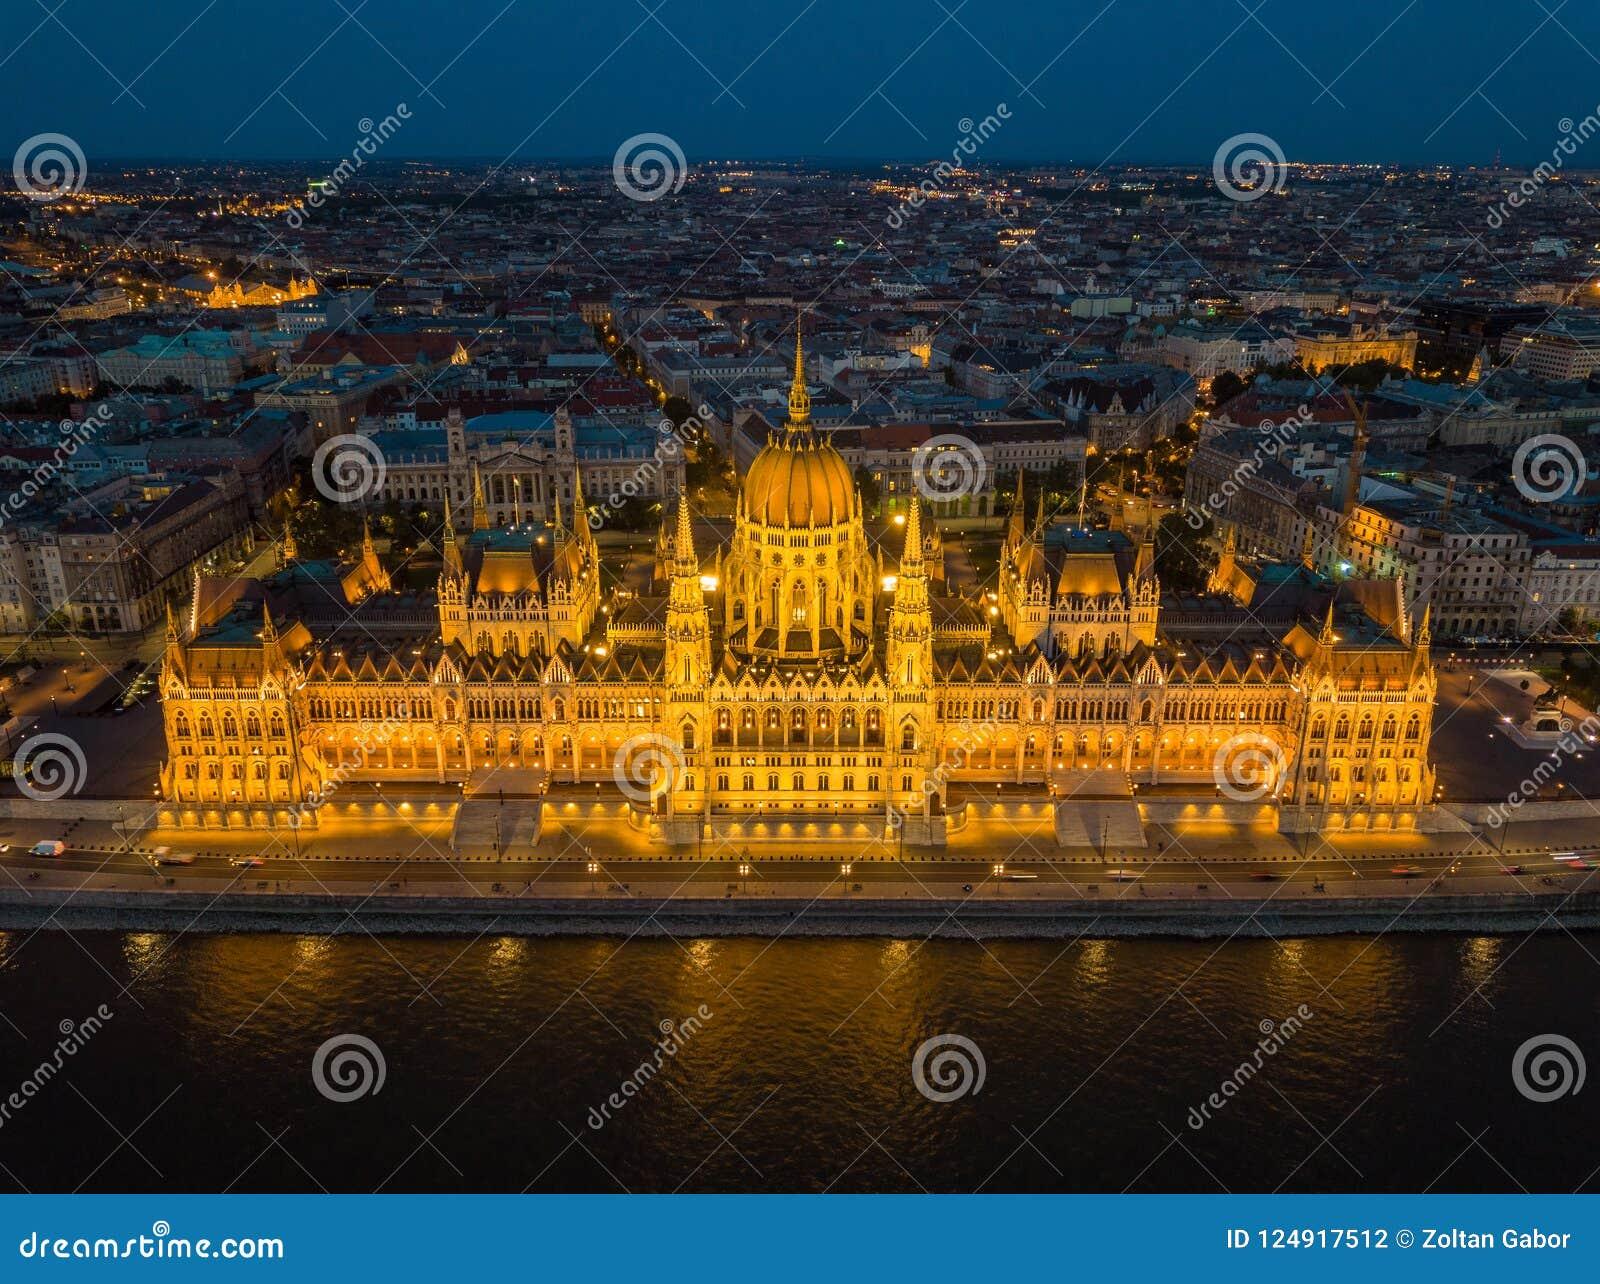 Будапешт, Венгрия - вид с воздуха красивого загоренного парламента Венгрии Orszaghaz на голубом часе